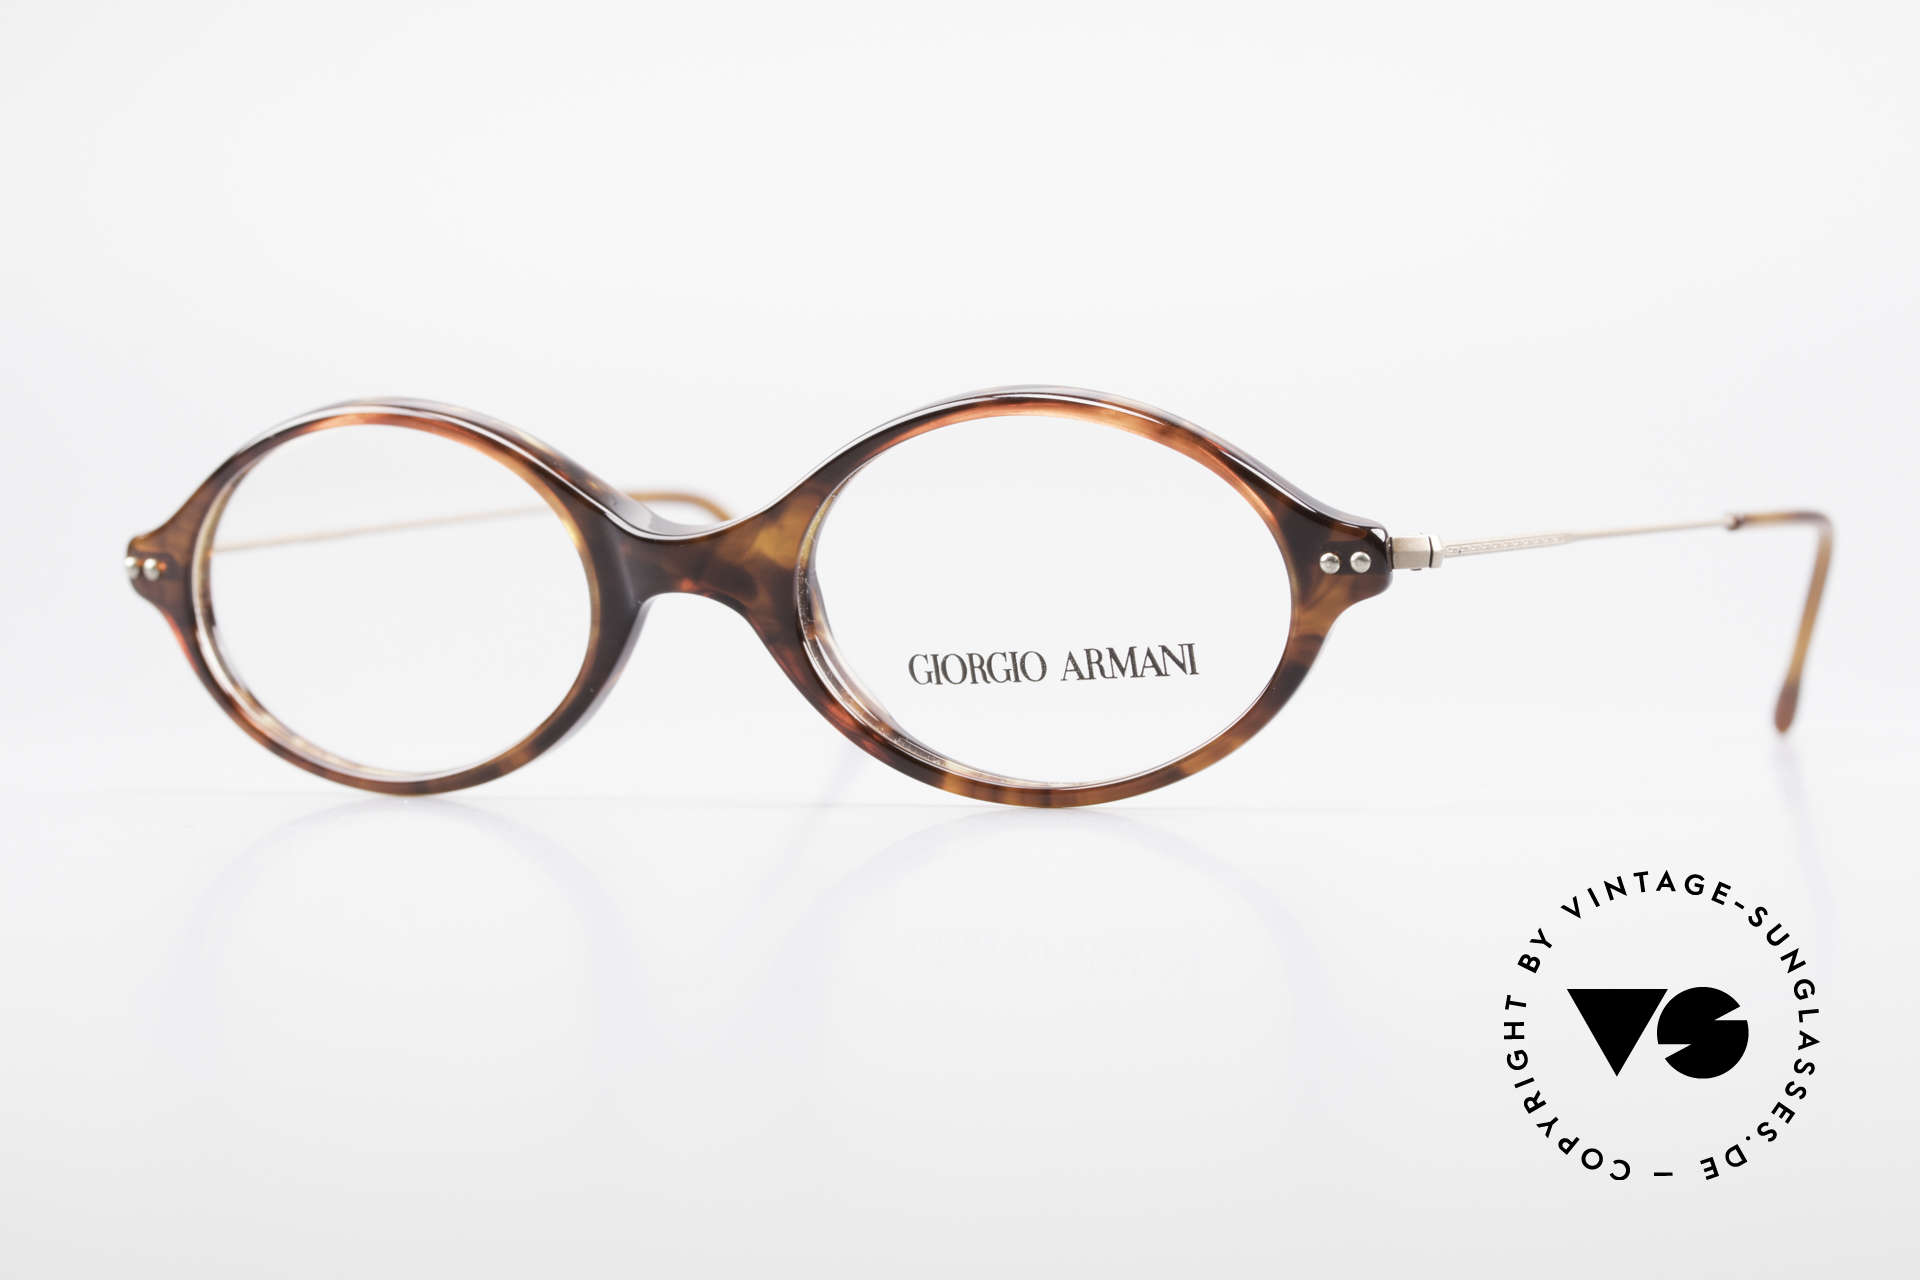 7ee9cda7dd0d Glasses Giorgio Armani 378 90 s Unisex Eyeglasses Oval